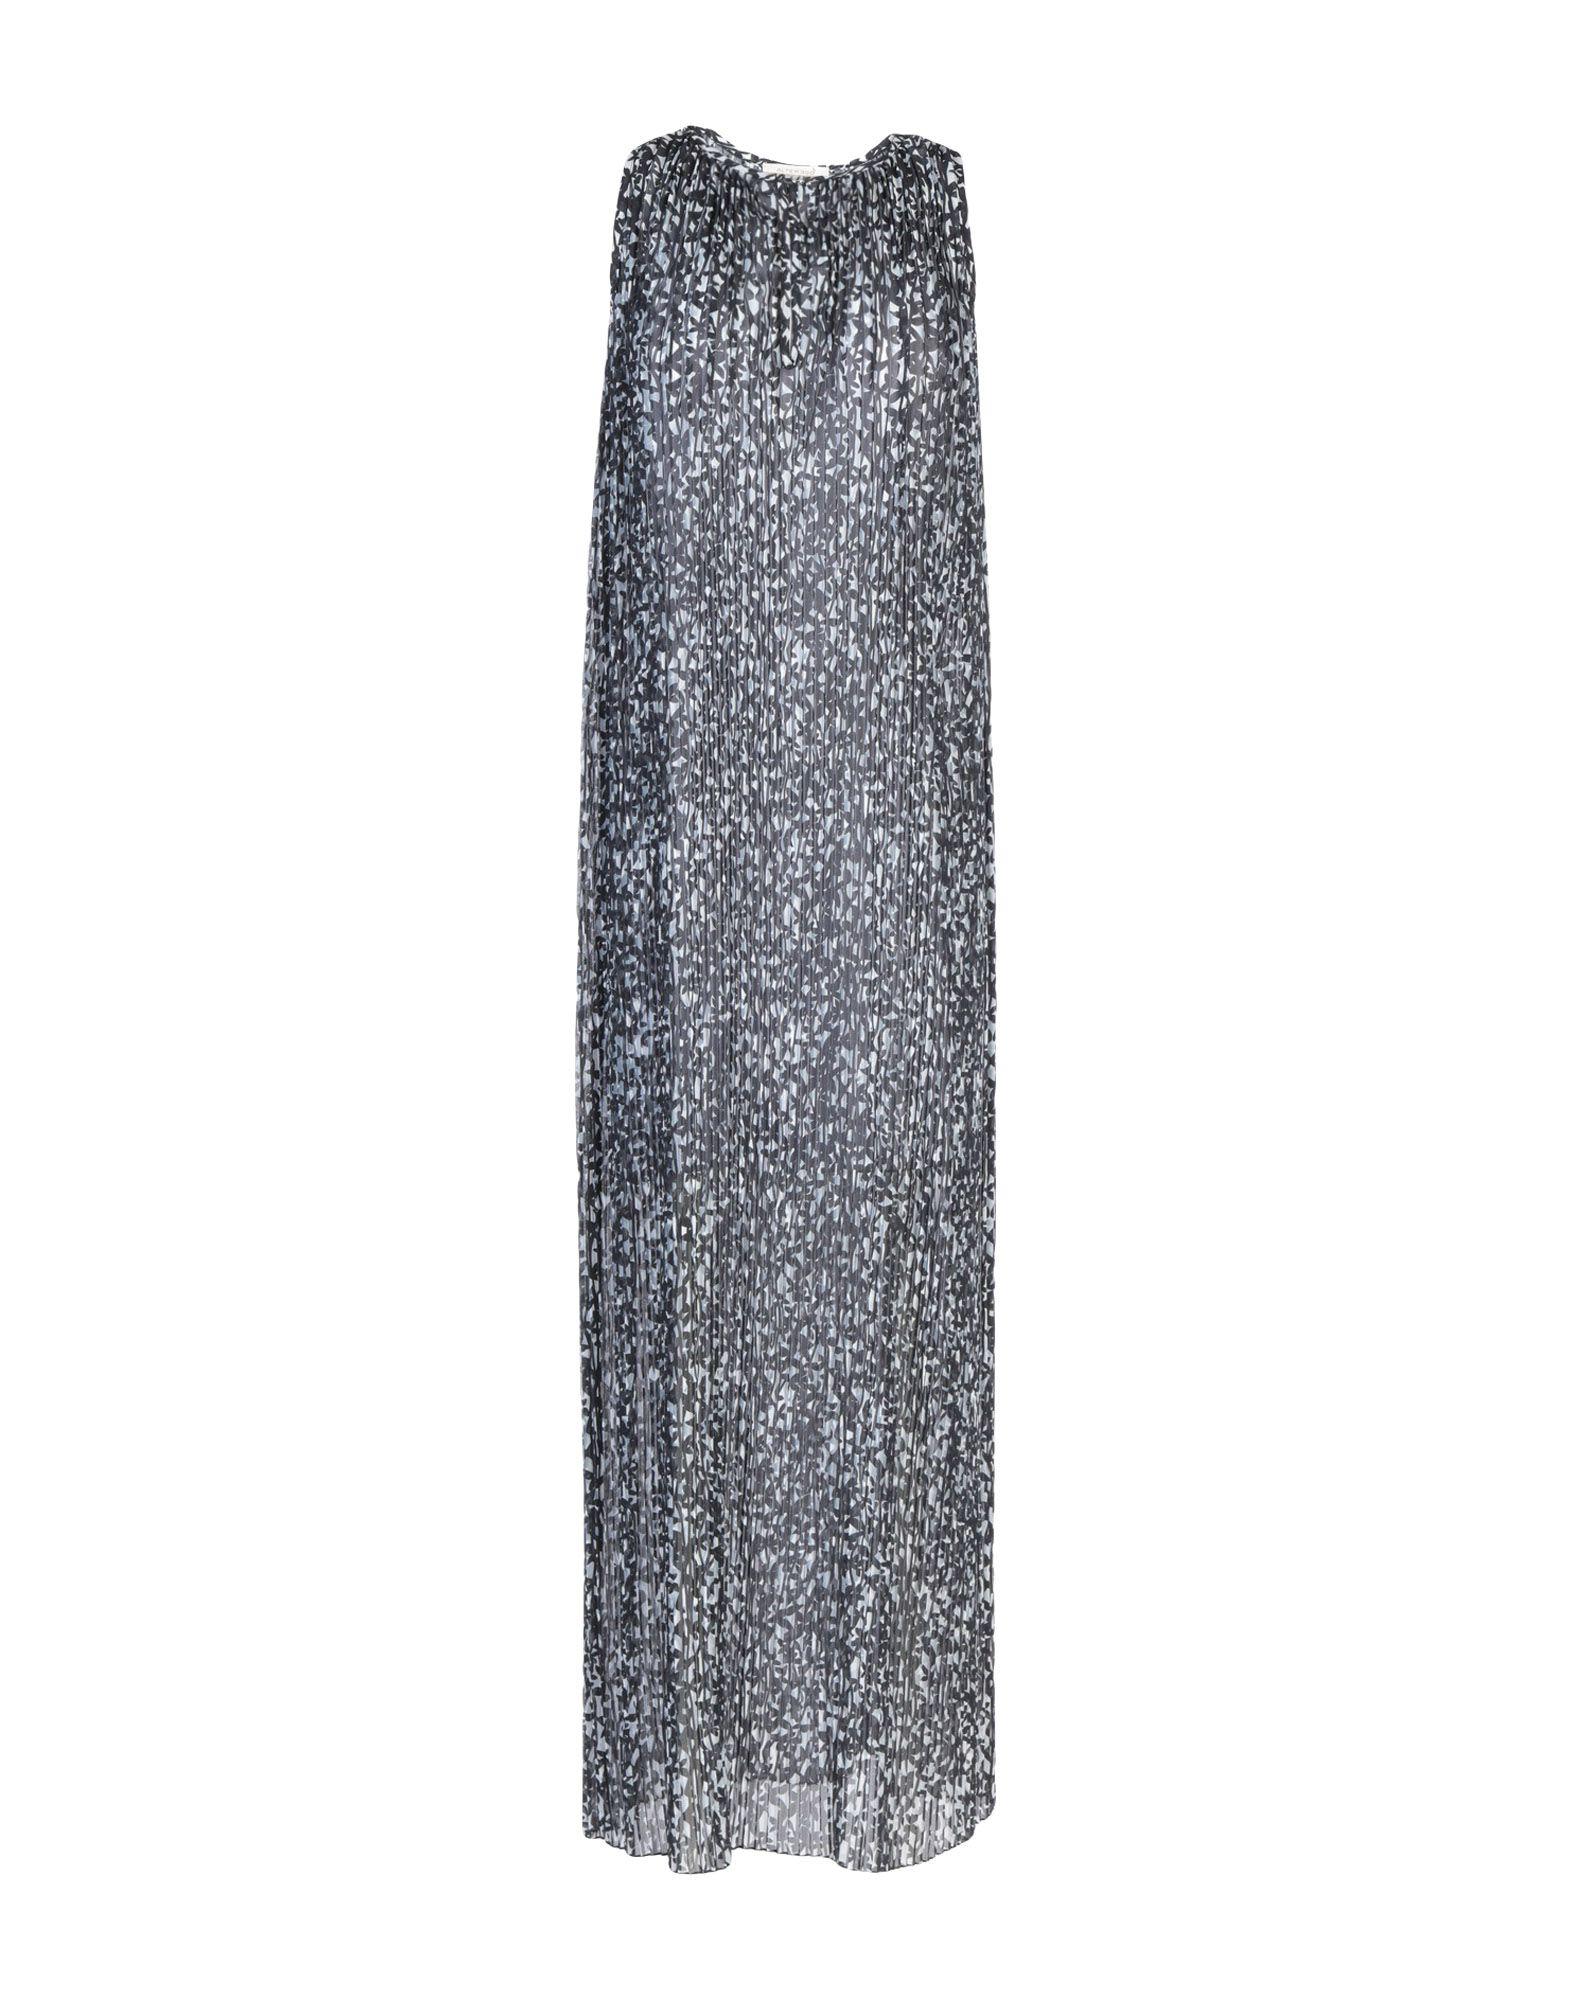 ALTEЯƎGO Длинное платье